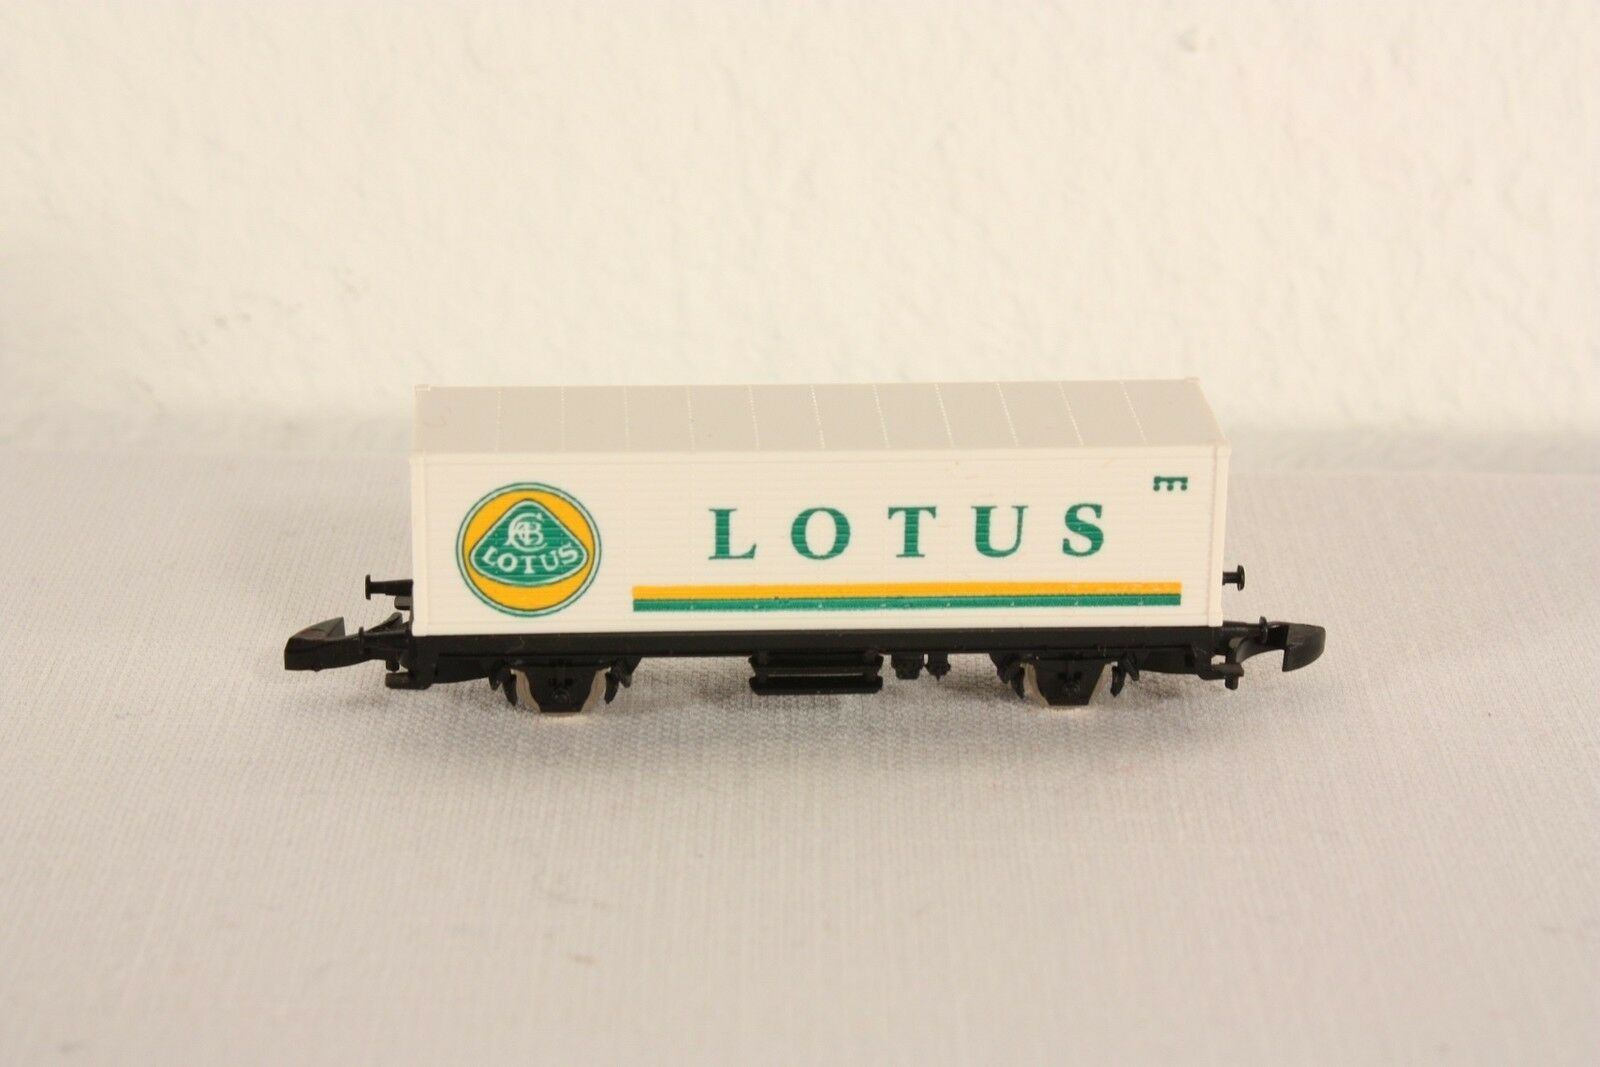 Märklin Spur Z,   Lotus   1 220, Top                ab882